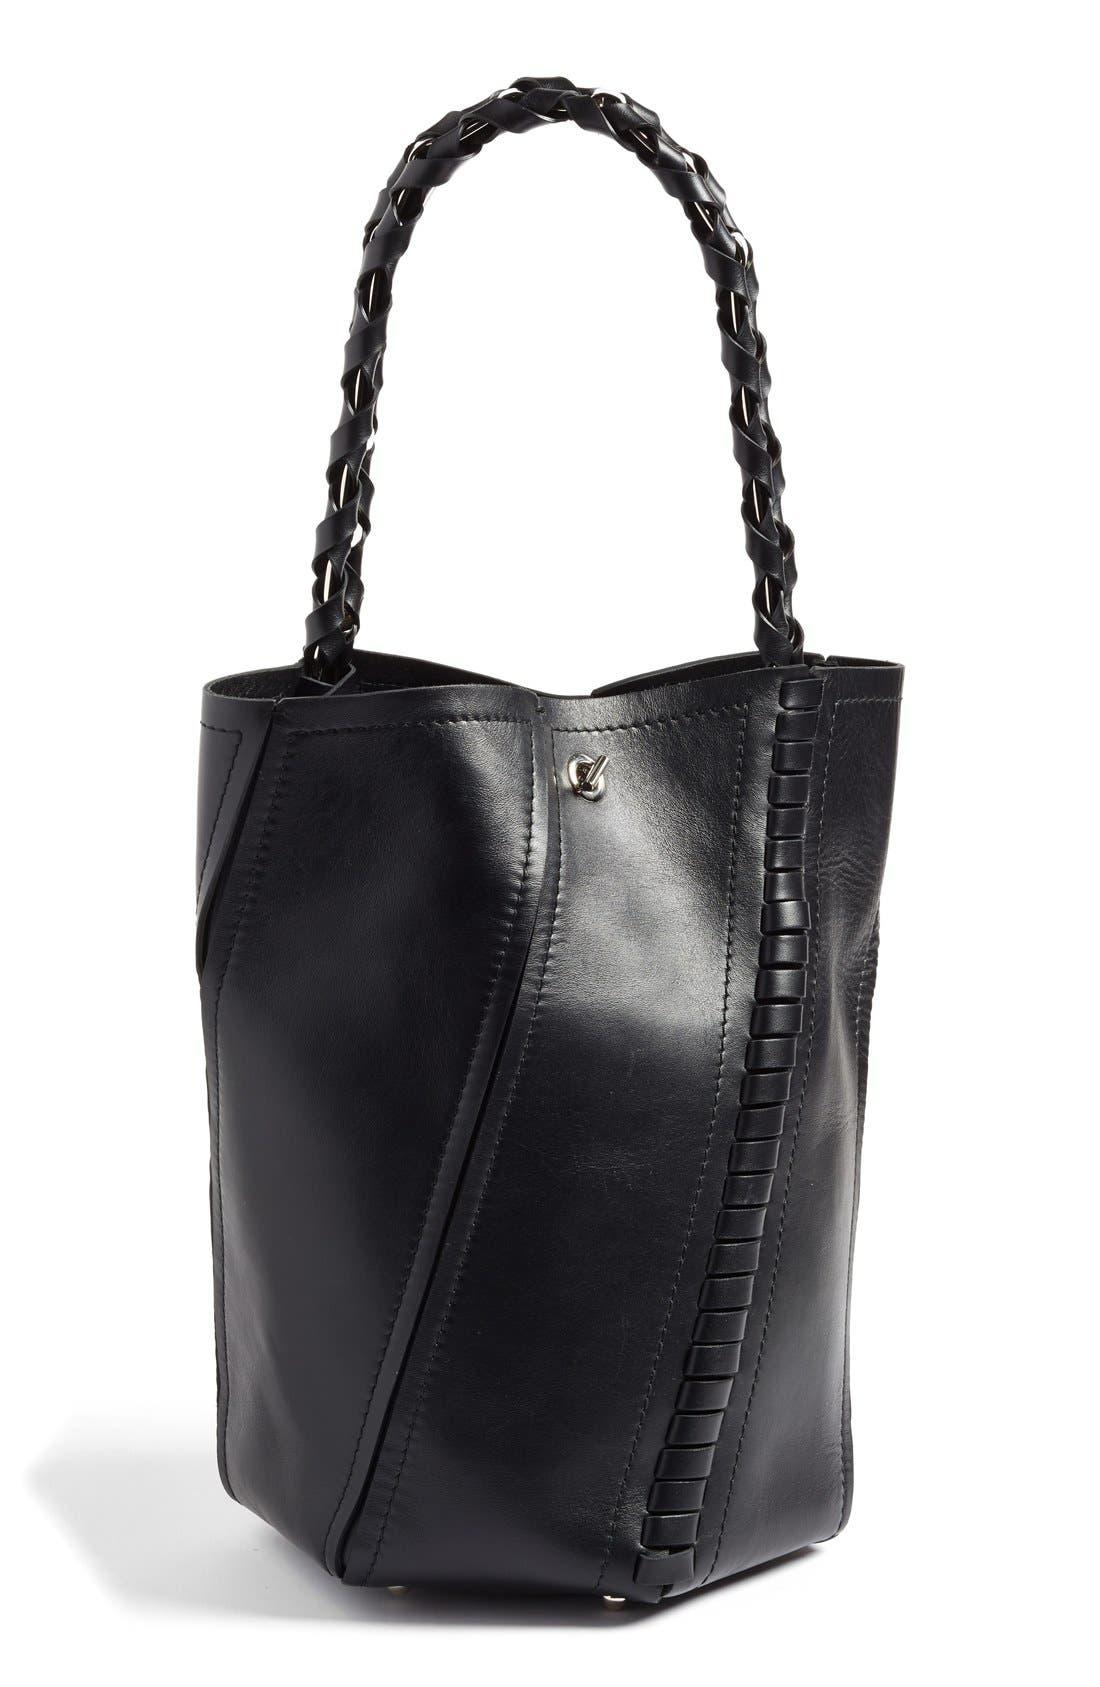 PROENZA SCHOULER 'Medium Hex' Whipstitch Leather Bucket Bag, Main, color, BLACK